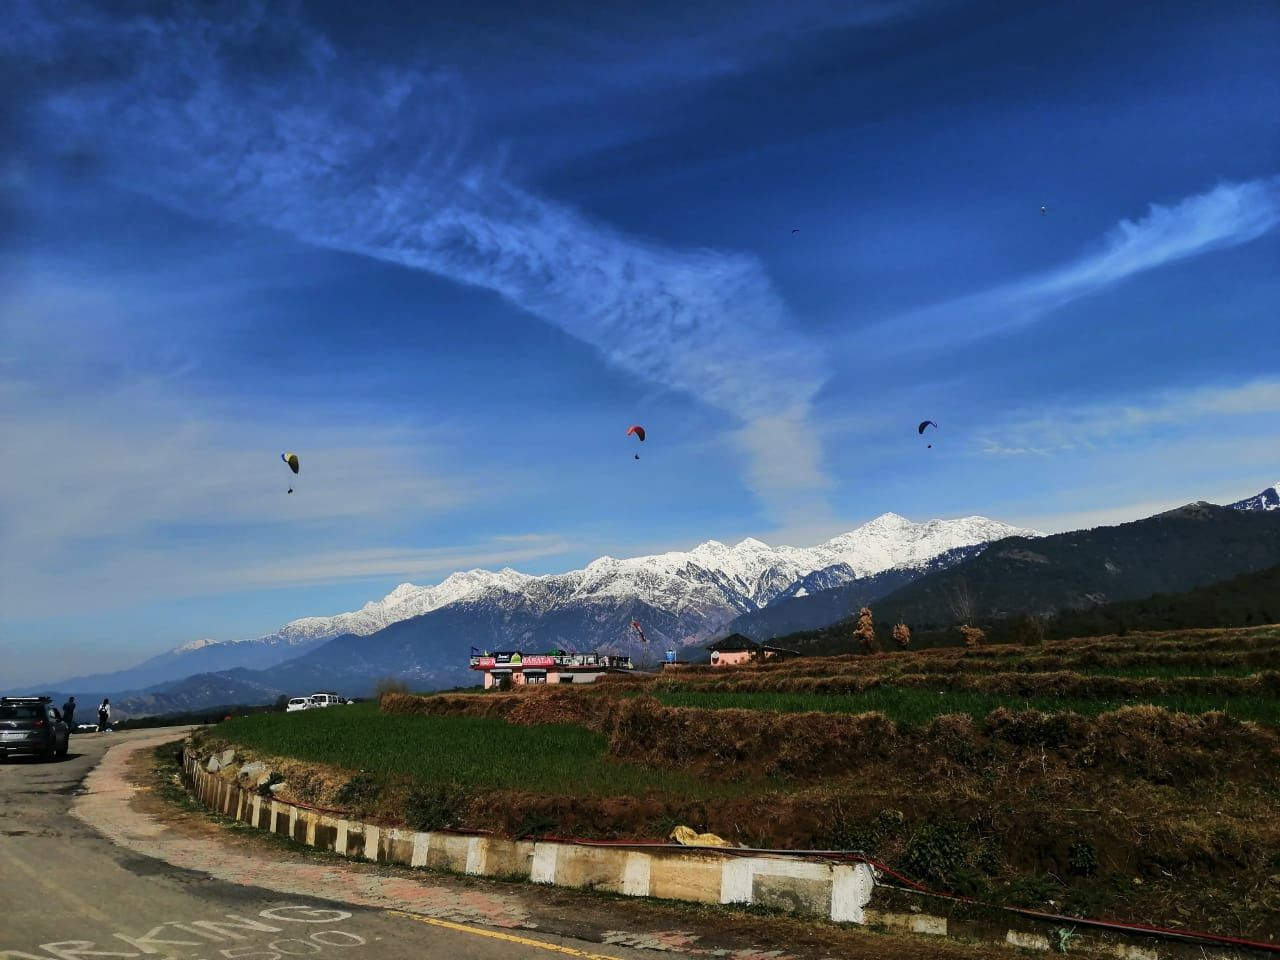 Photo of Bir Billing Paragliding By Akhil